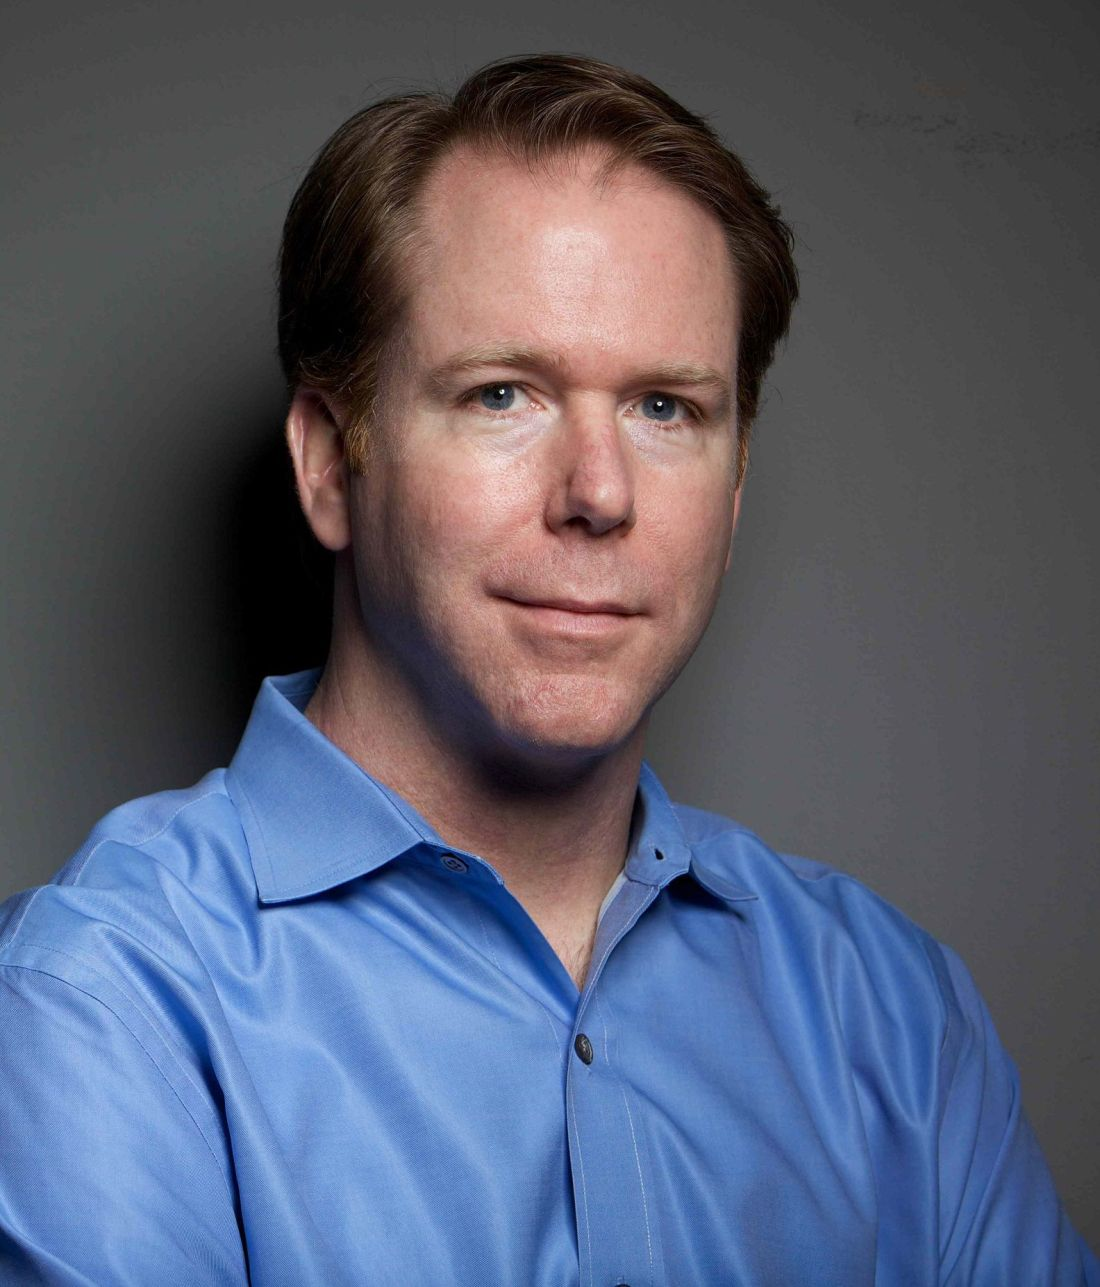 David Brindley, Managin Editor, National Geographic Magazine